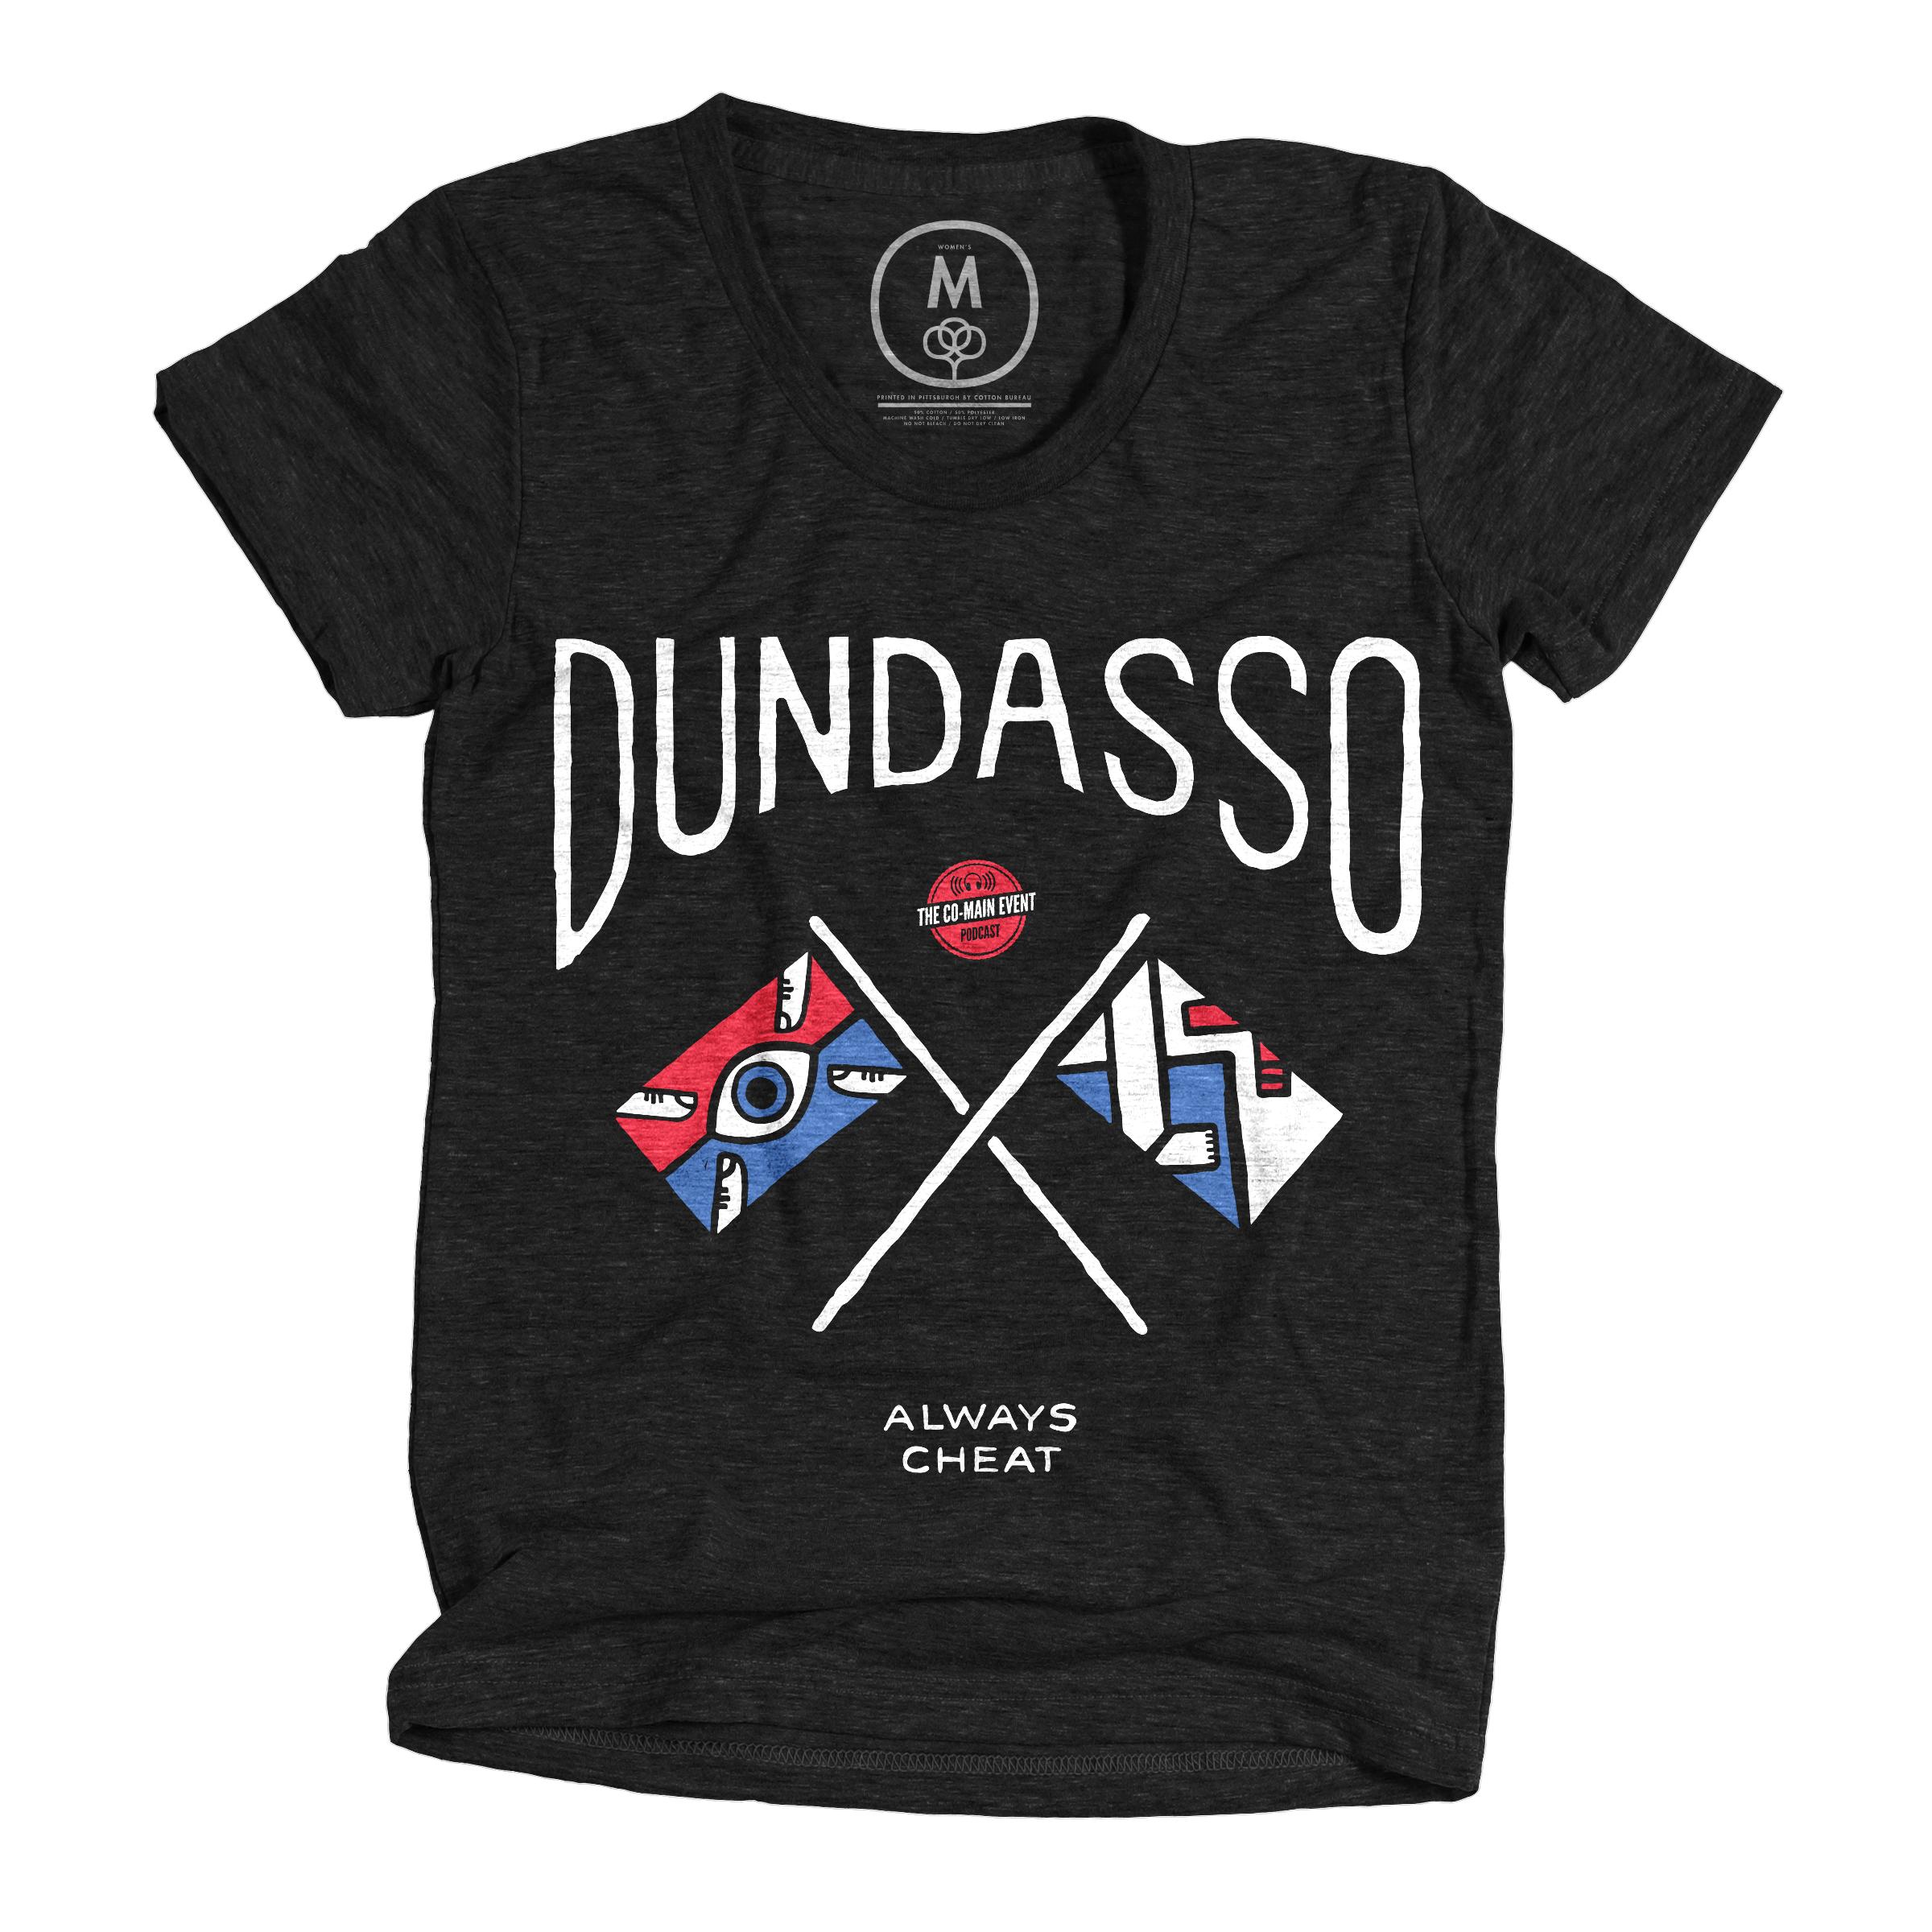 DUNDASSO! Vintage Black (Women's)